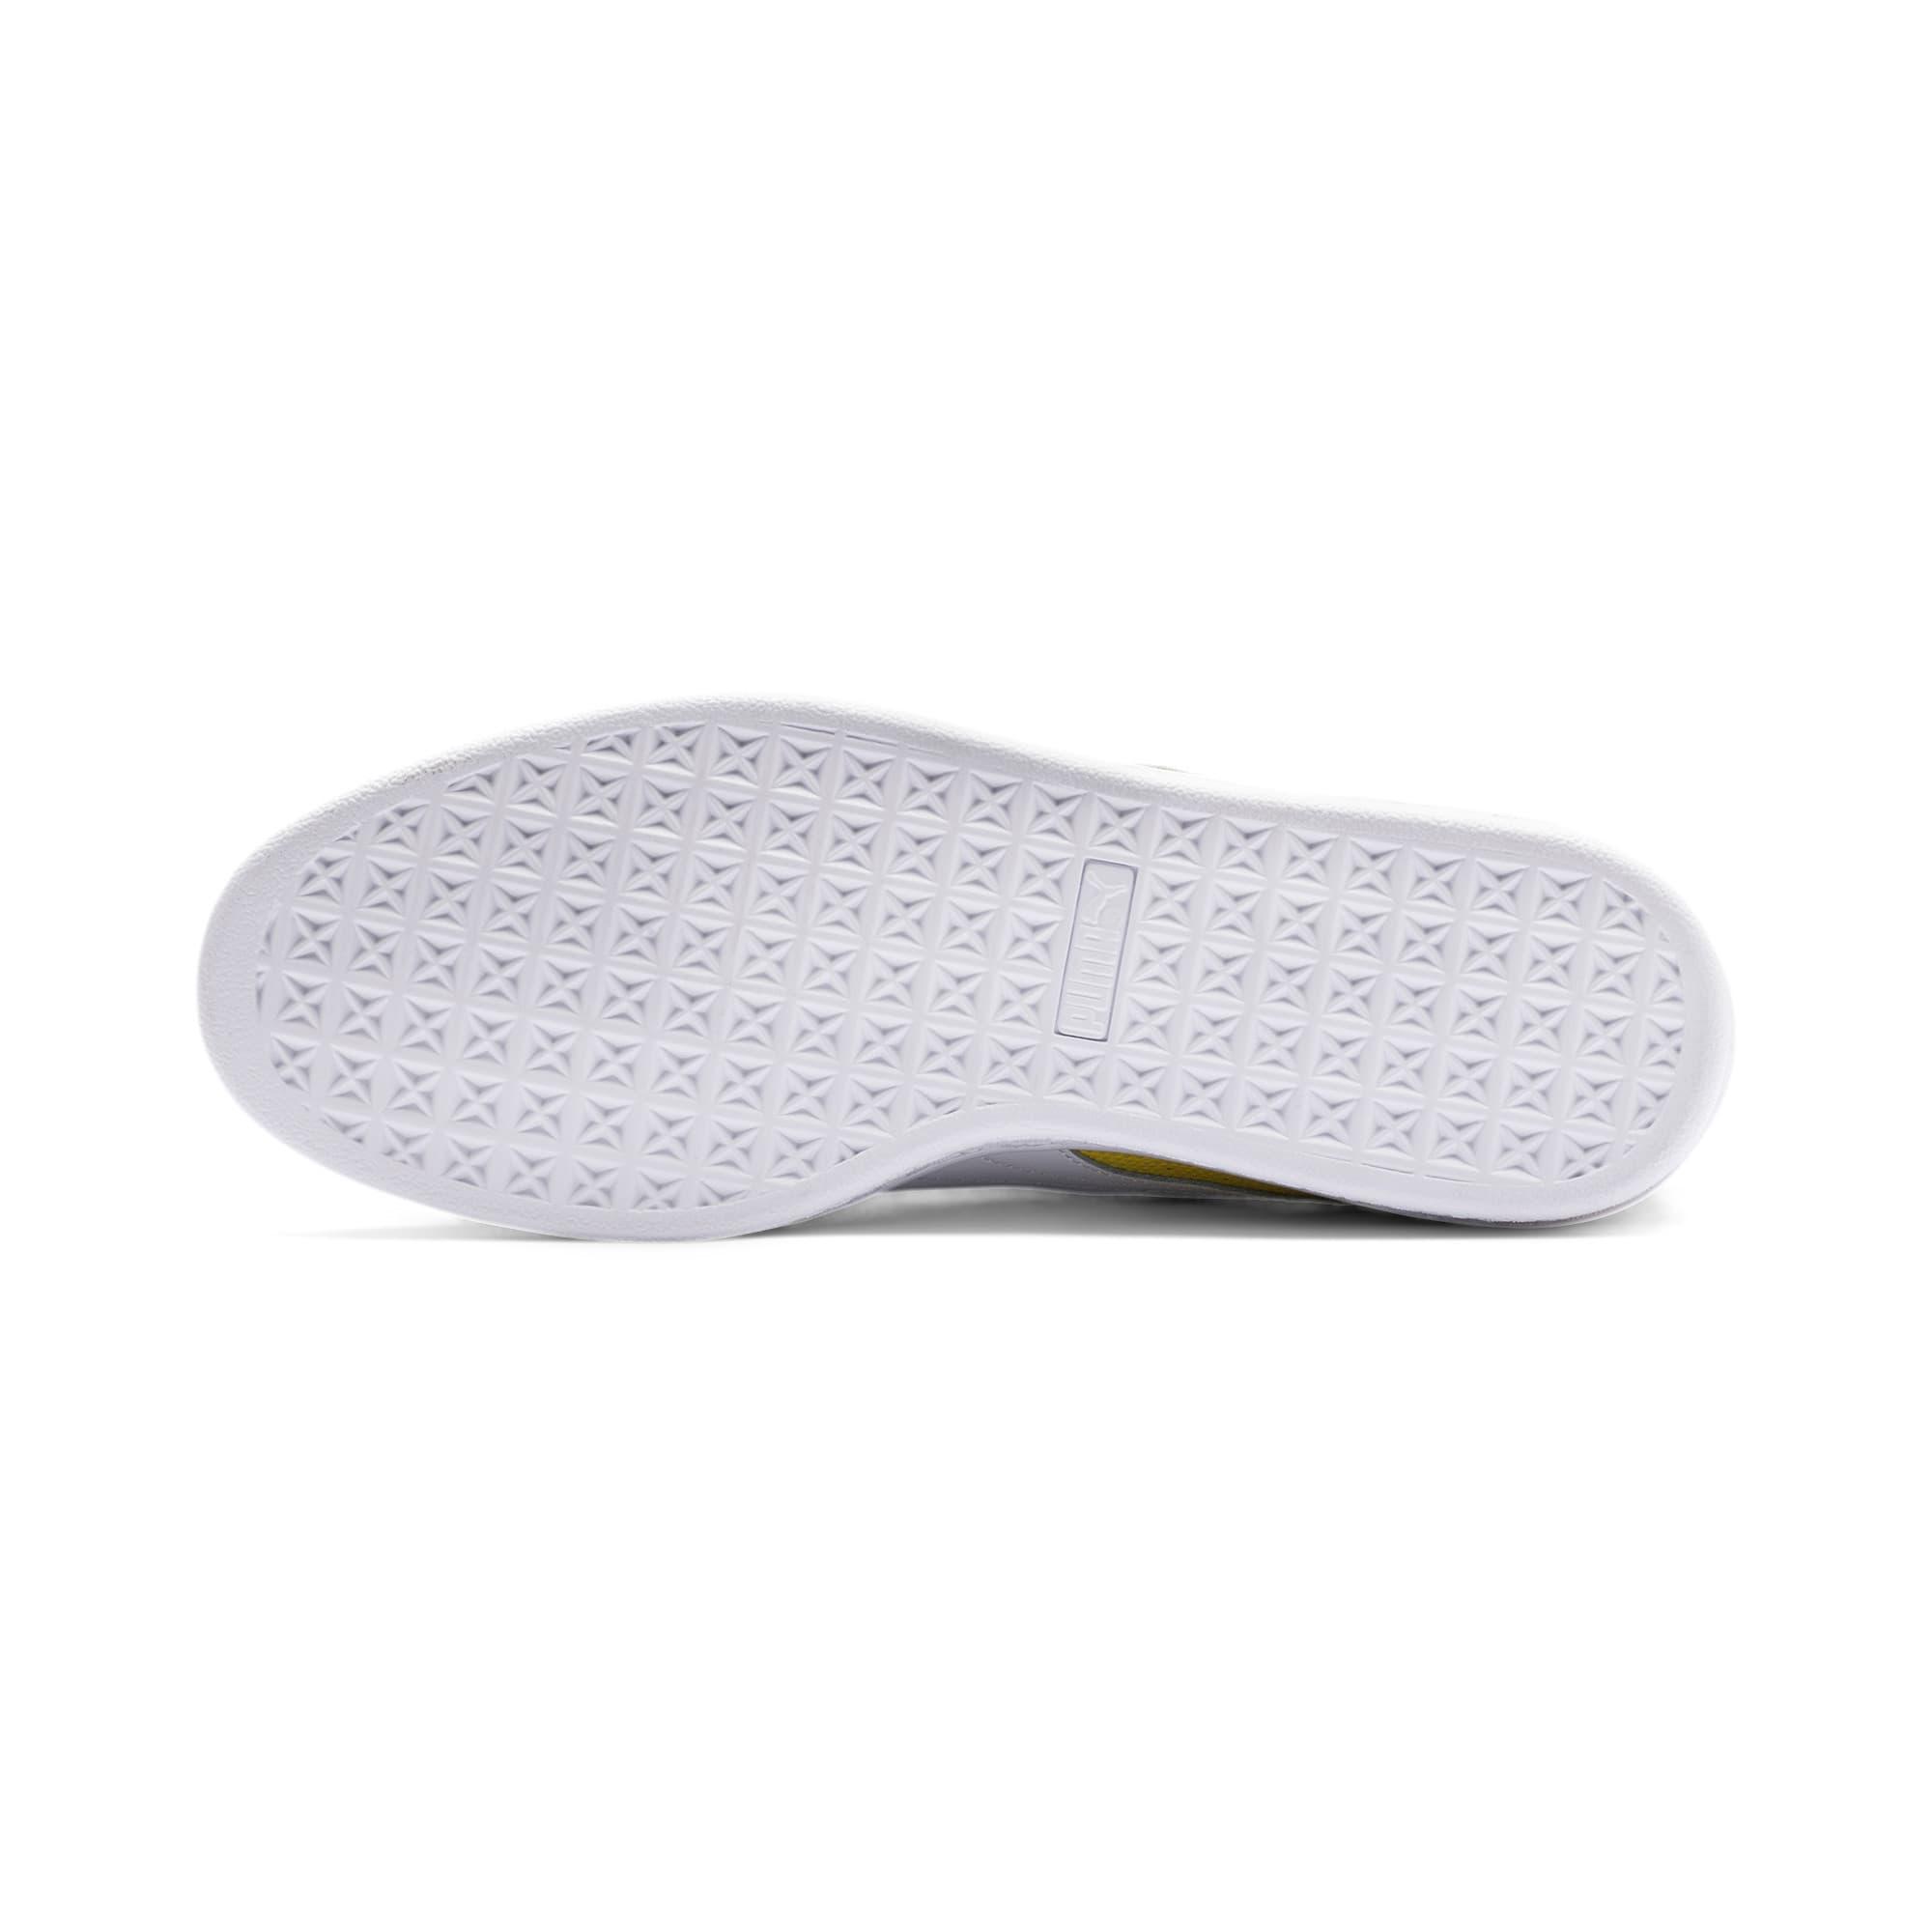 Miniatura 4 de Zapatos deportivos Suede Classic Block, Peacoat-Sulphur-Puma White, mediano